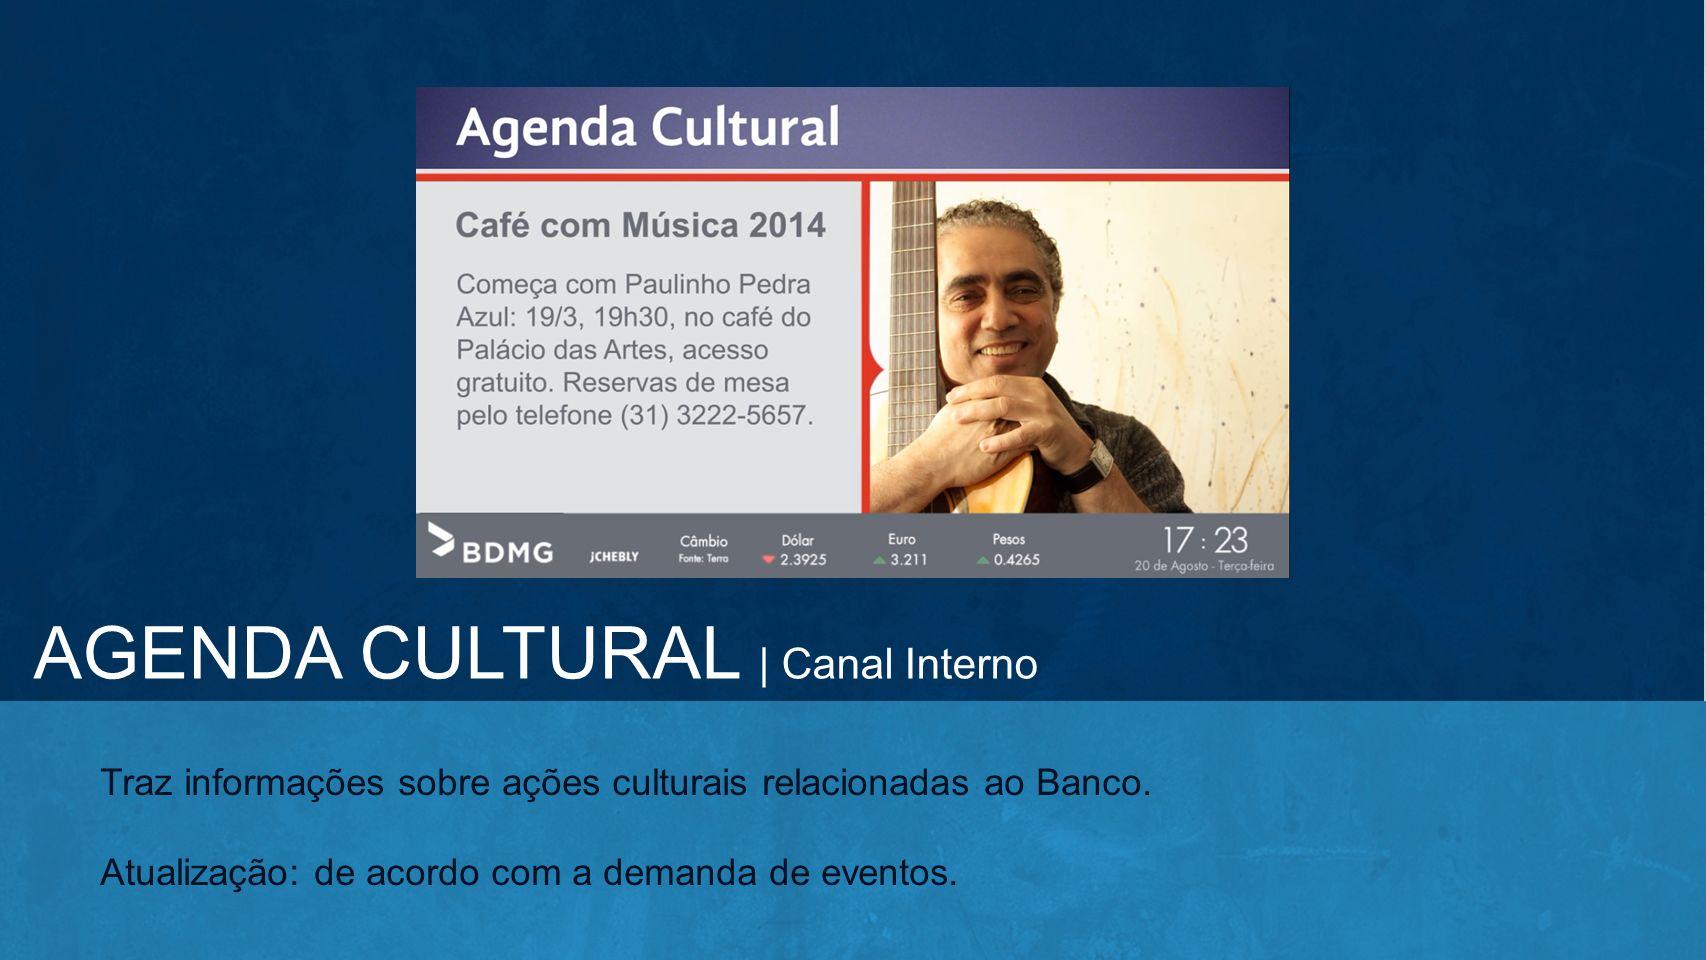 AGENDA CULTURAL | Canal Interno